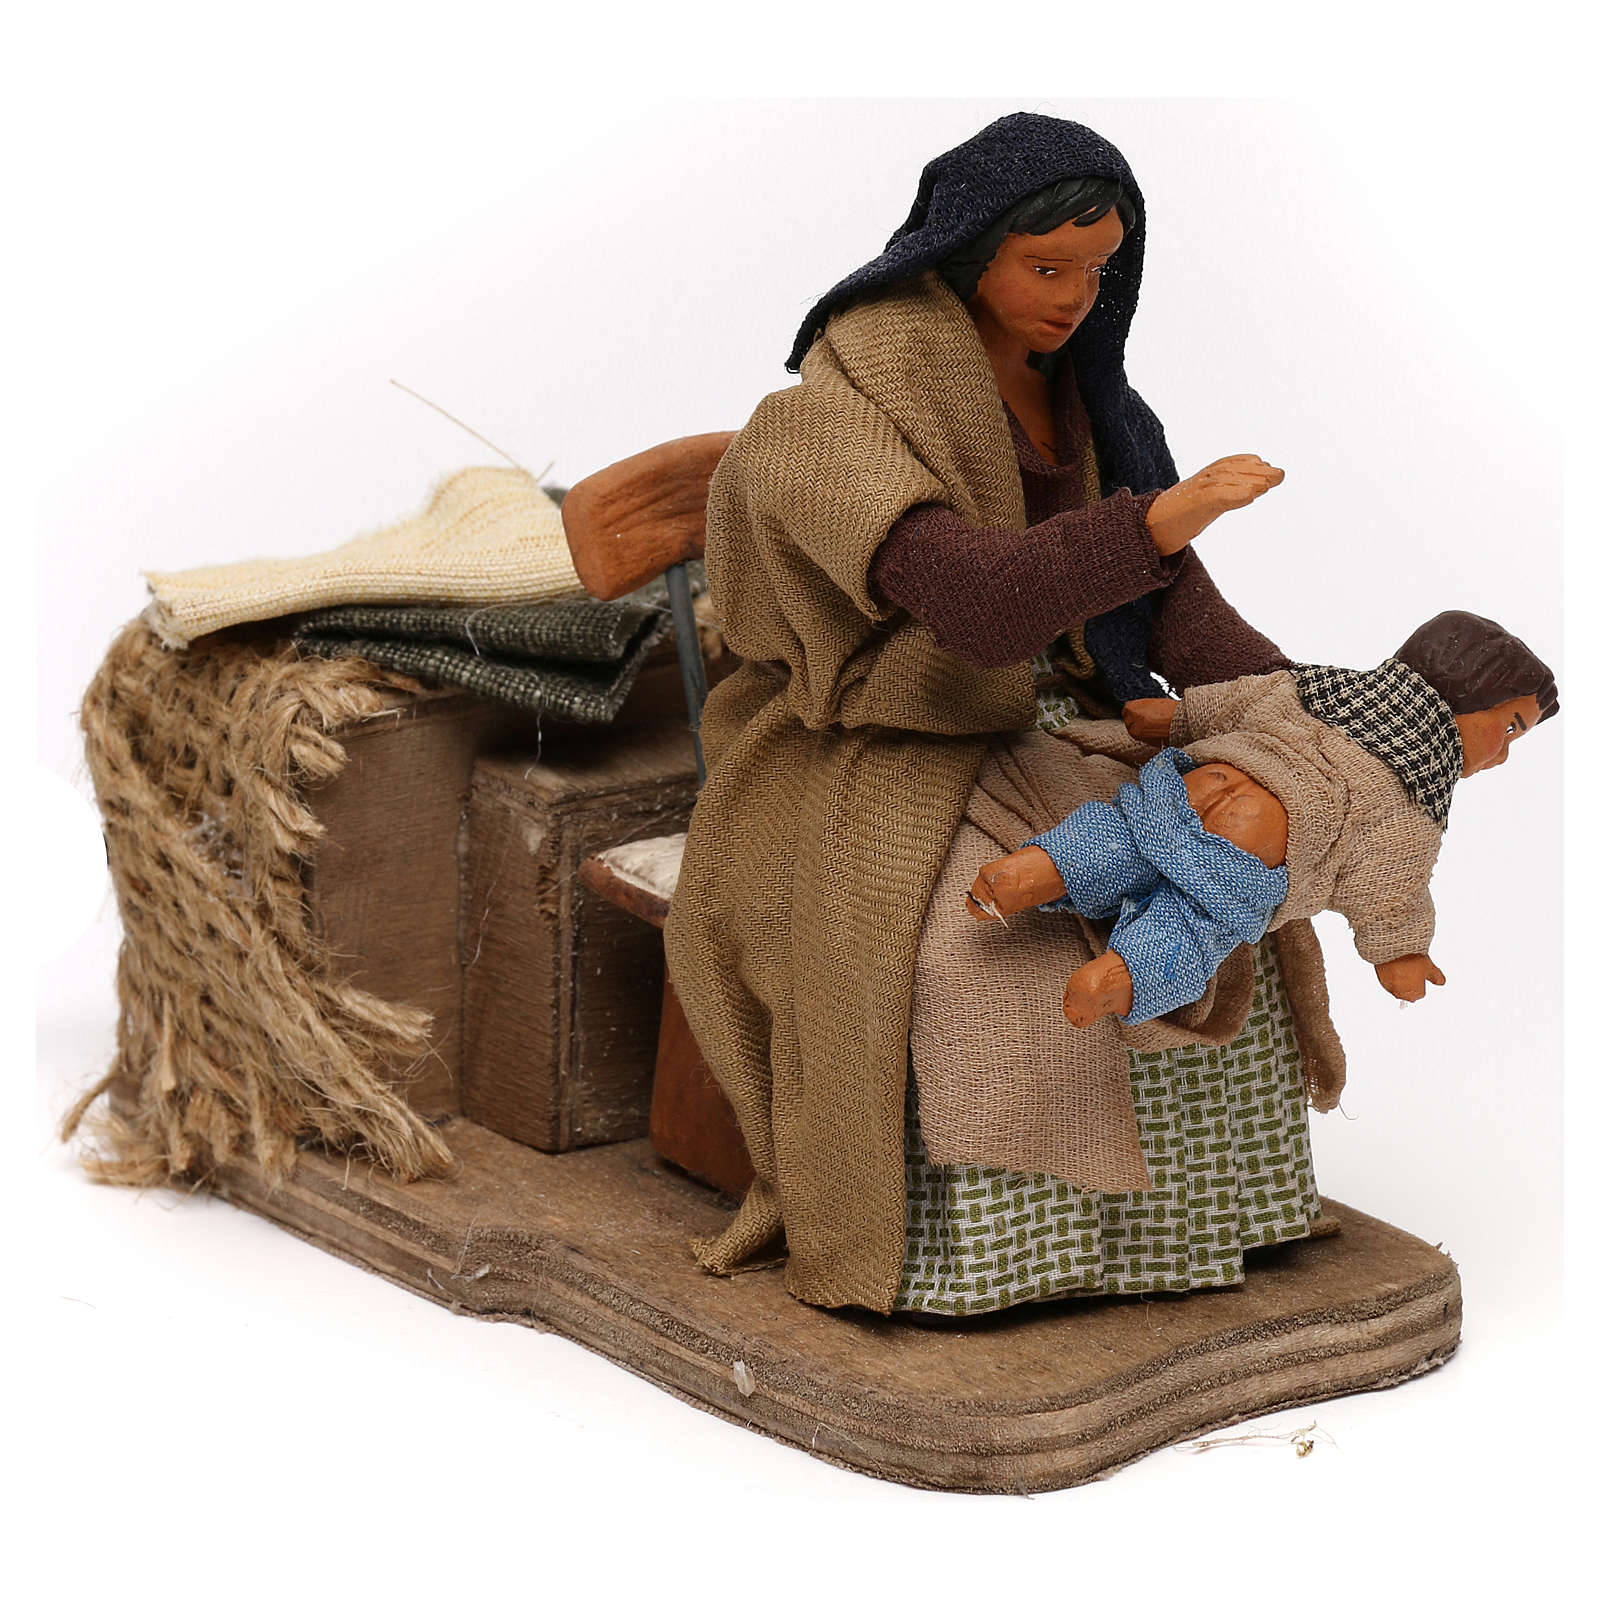 Mom spanking child, 12 cm moving Neapolitan nativity